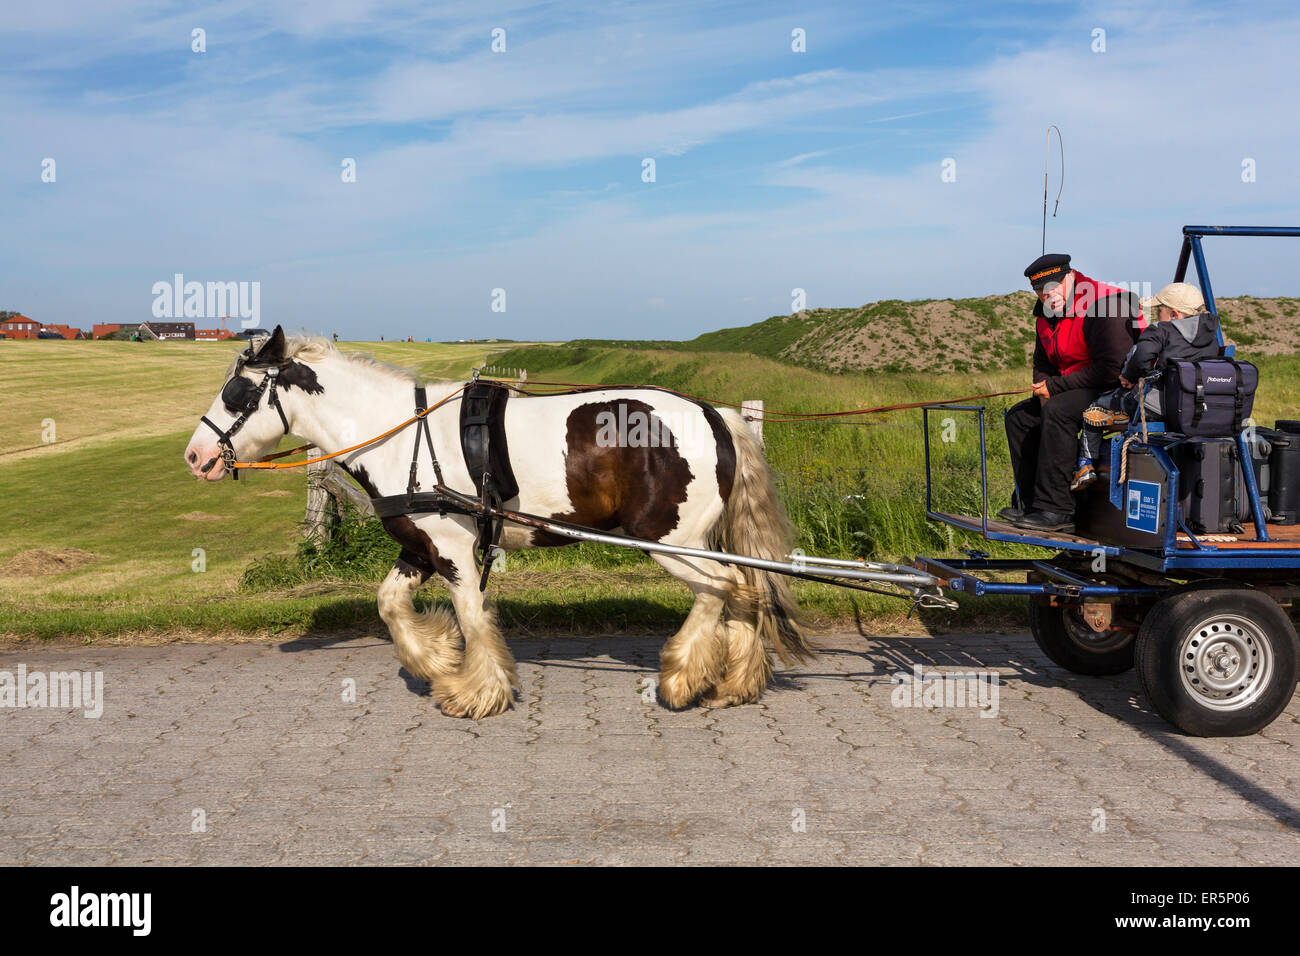 Horse and cart luggage service, Juist Island, Nationalpark, North Sea, East Frisian Islands, East Frisia, Lower - Stock Image